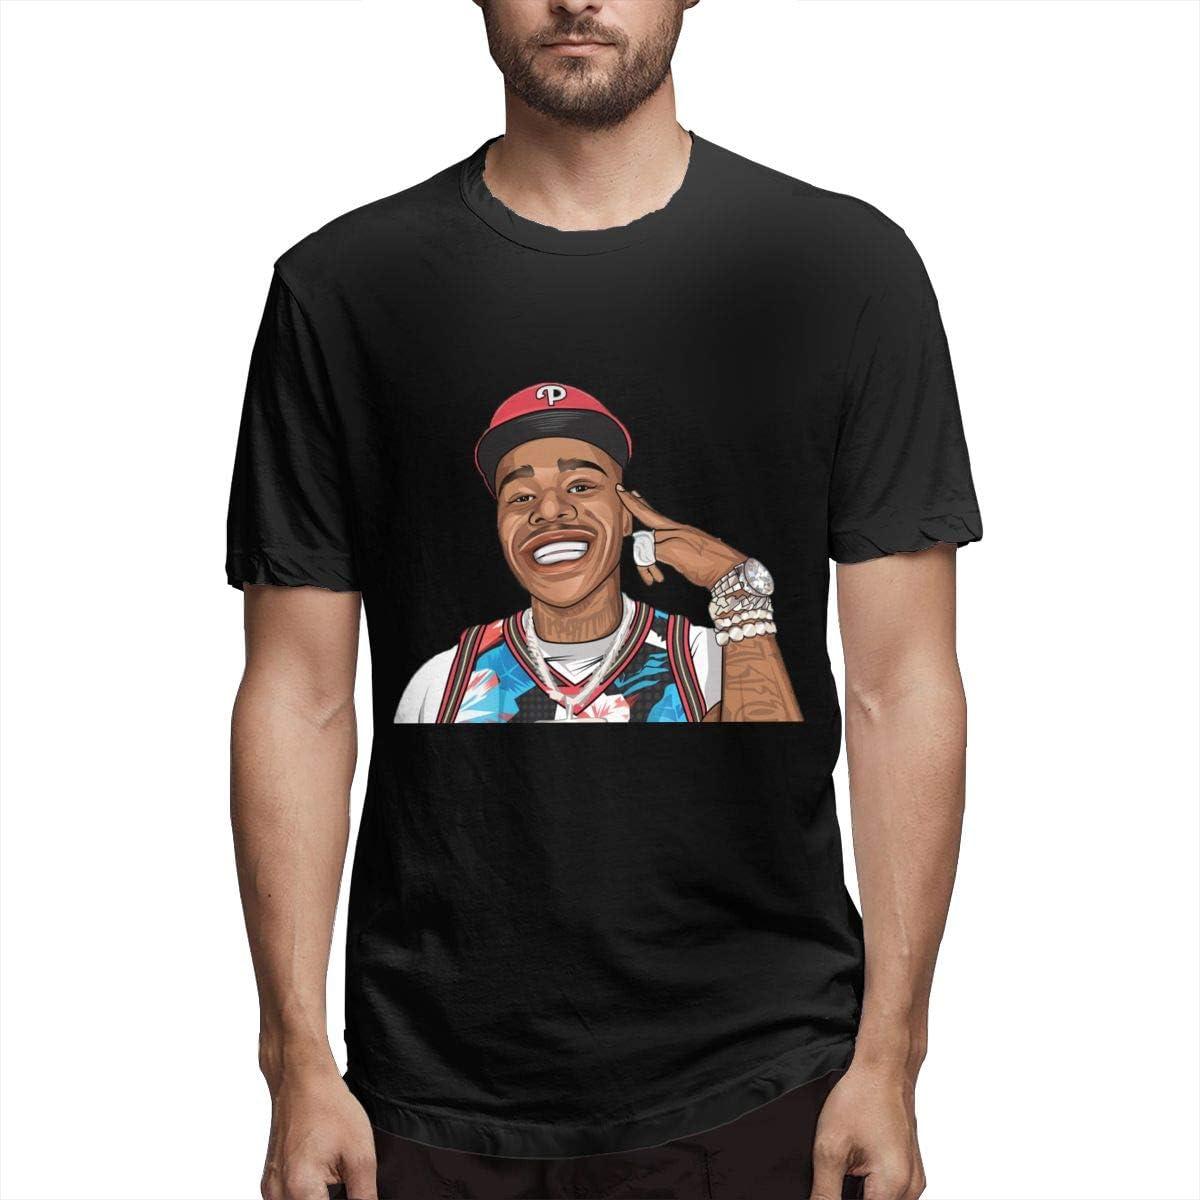 Shxjdthafa Dababy T-shirt Cool Dry Short-sleeved Sports Active Sports T-shirt Black